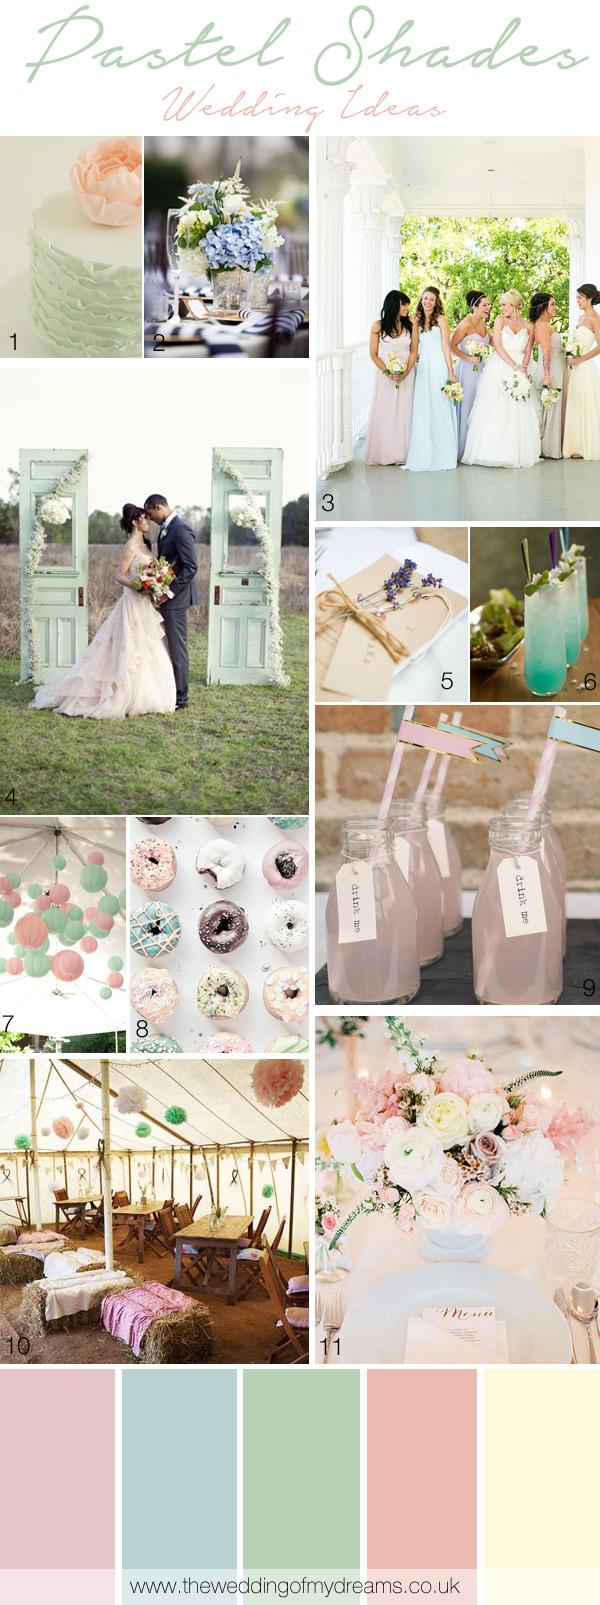 pastel wedding ideas and inspiration